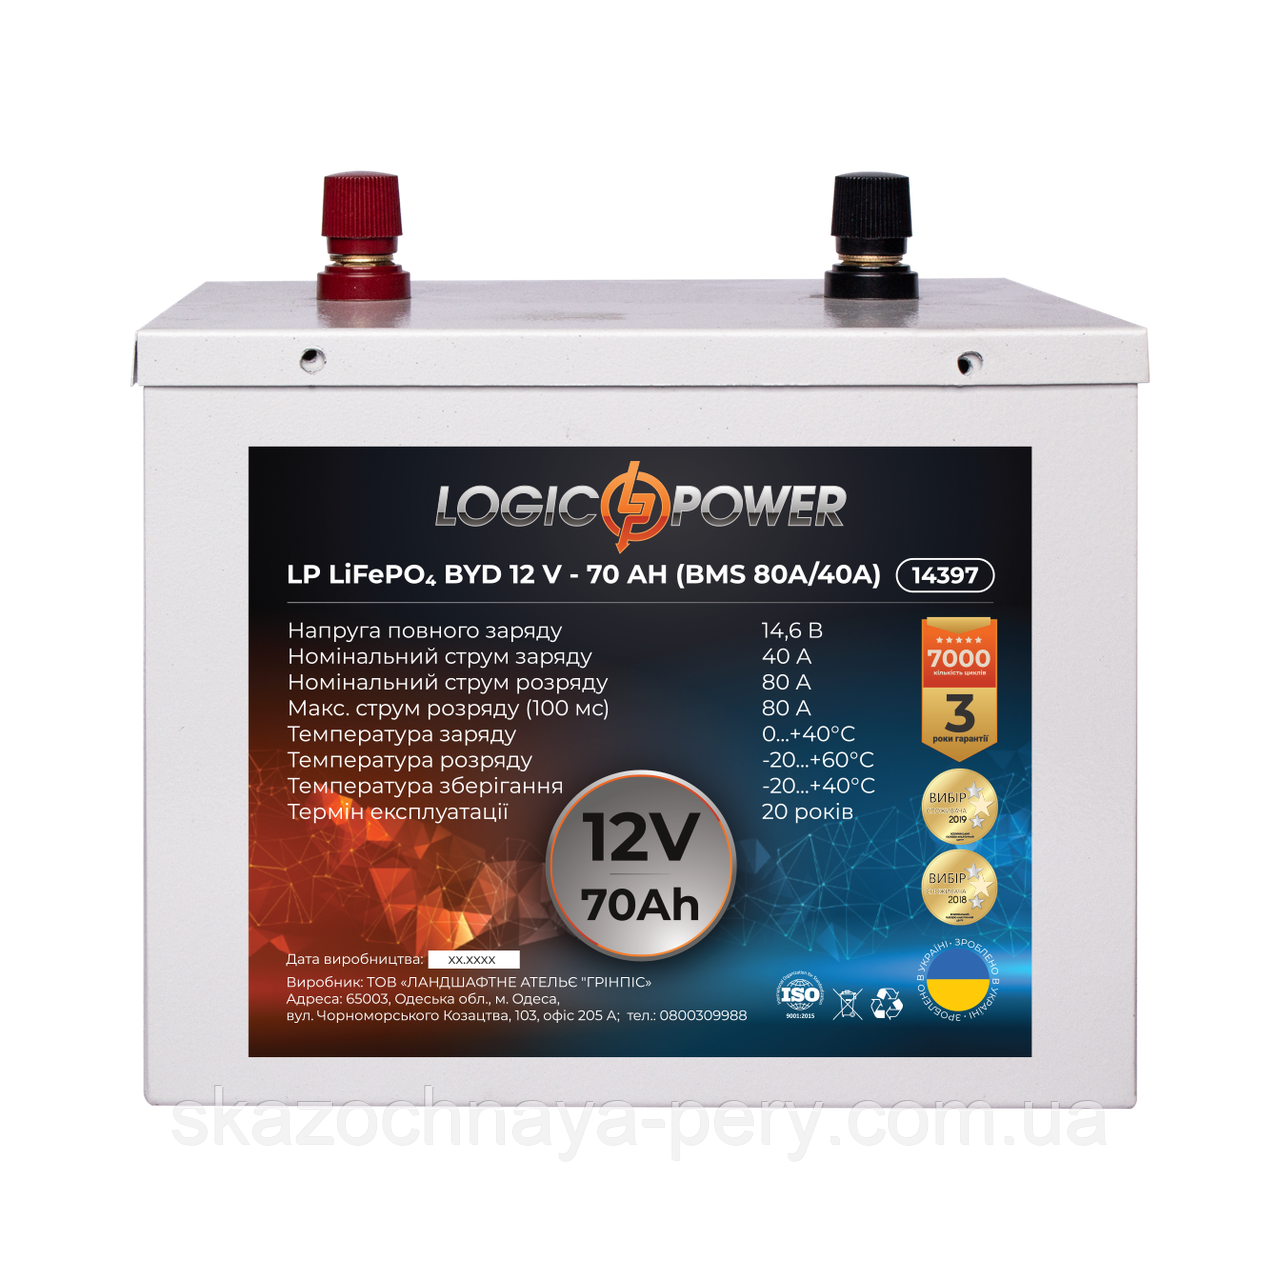 Аккумулятор LP LiFePO4 BYD 12V - 70 Ah (BMS 80A/40А) металл